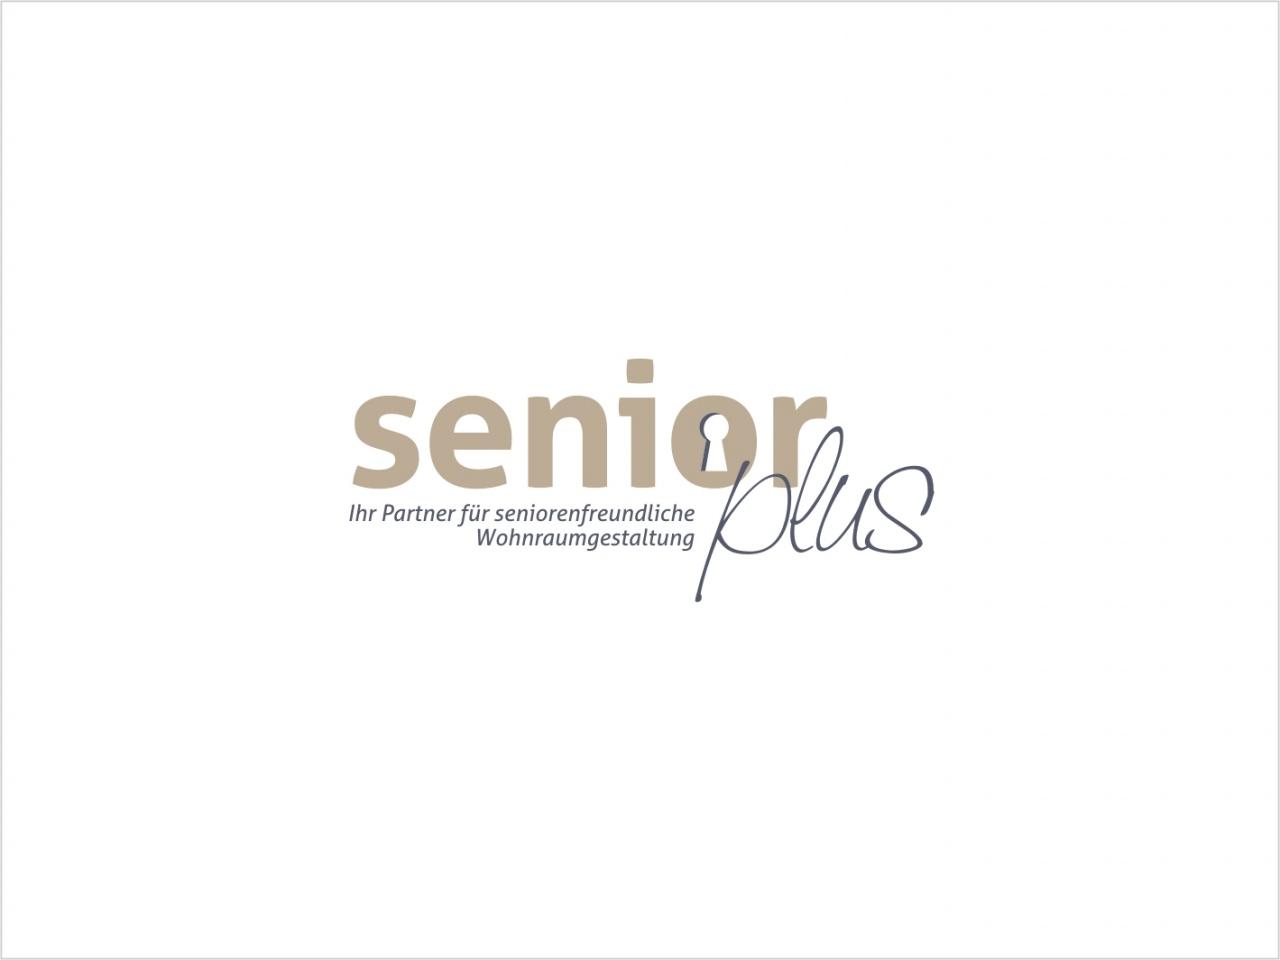 design #198 of mldesign